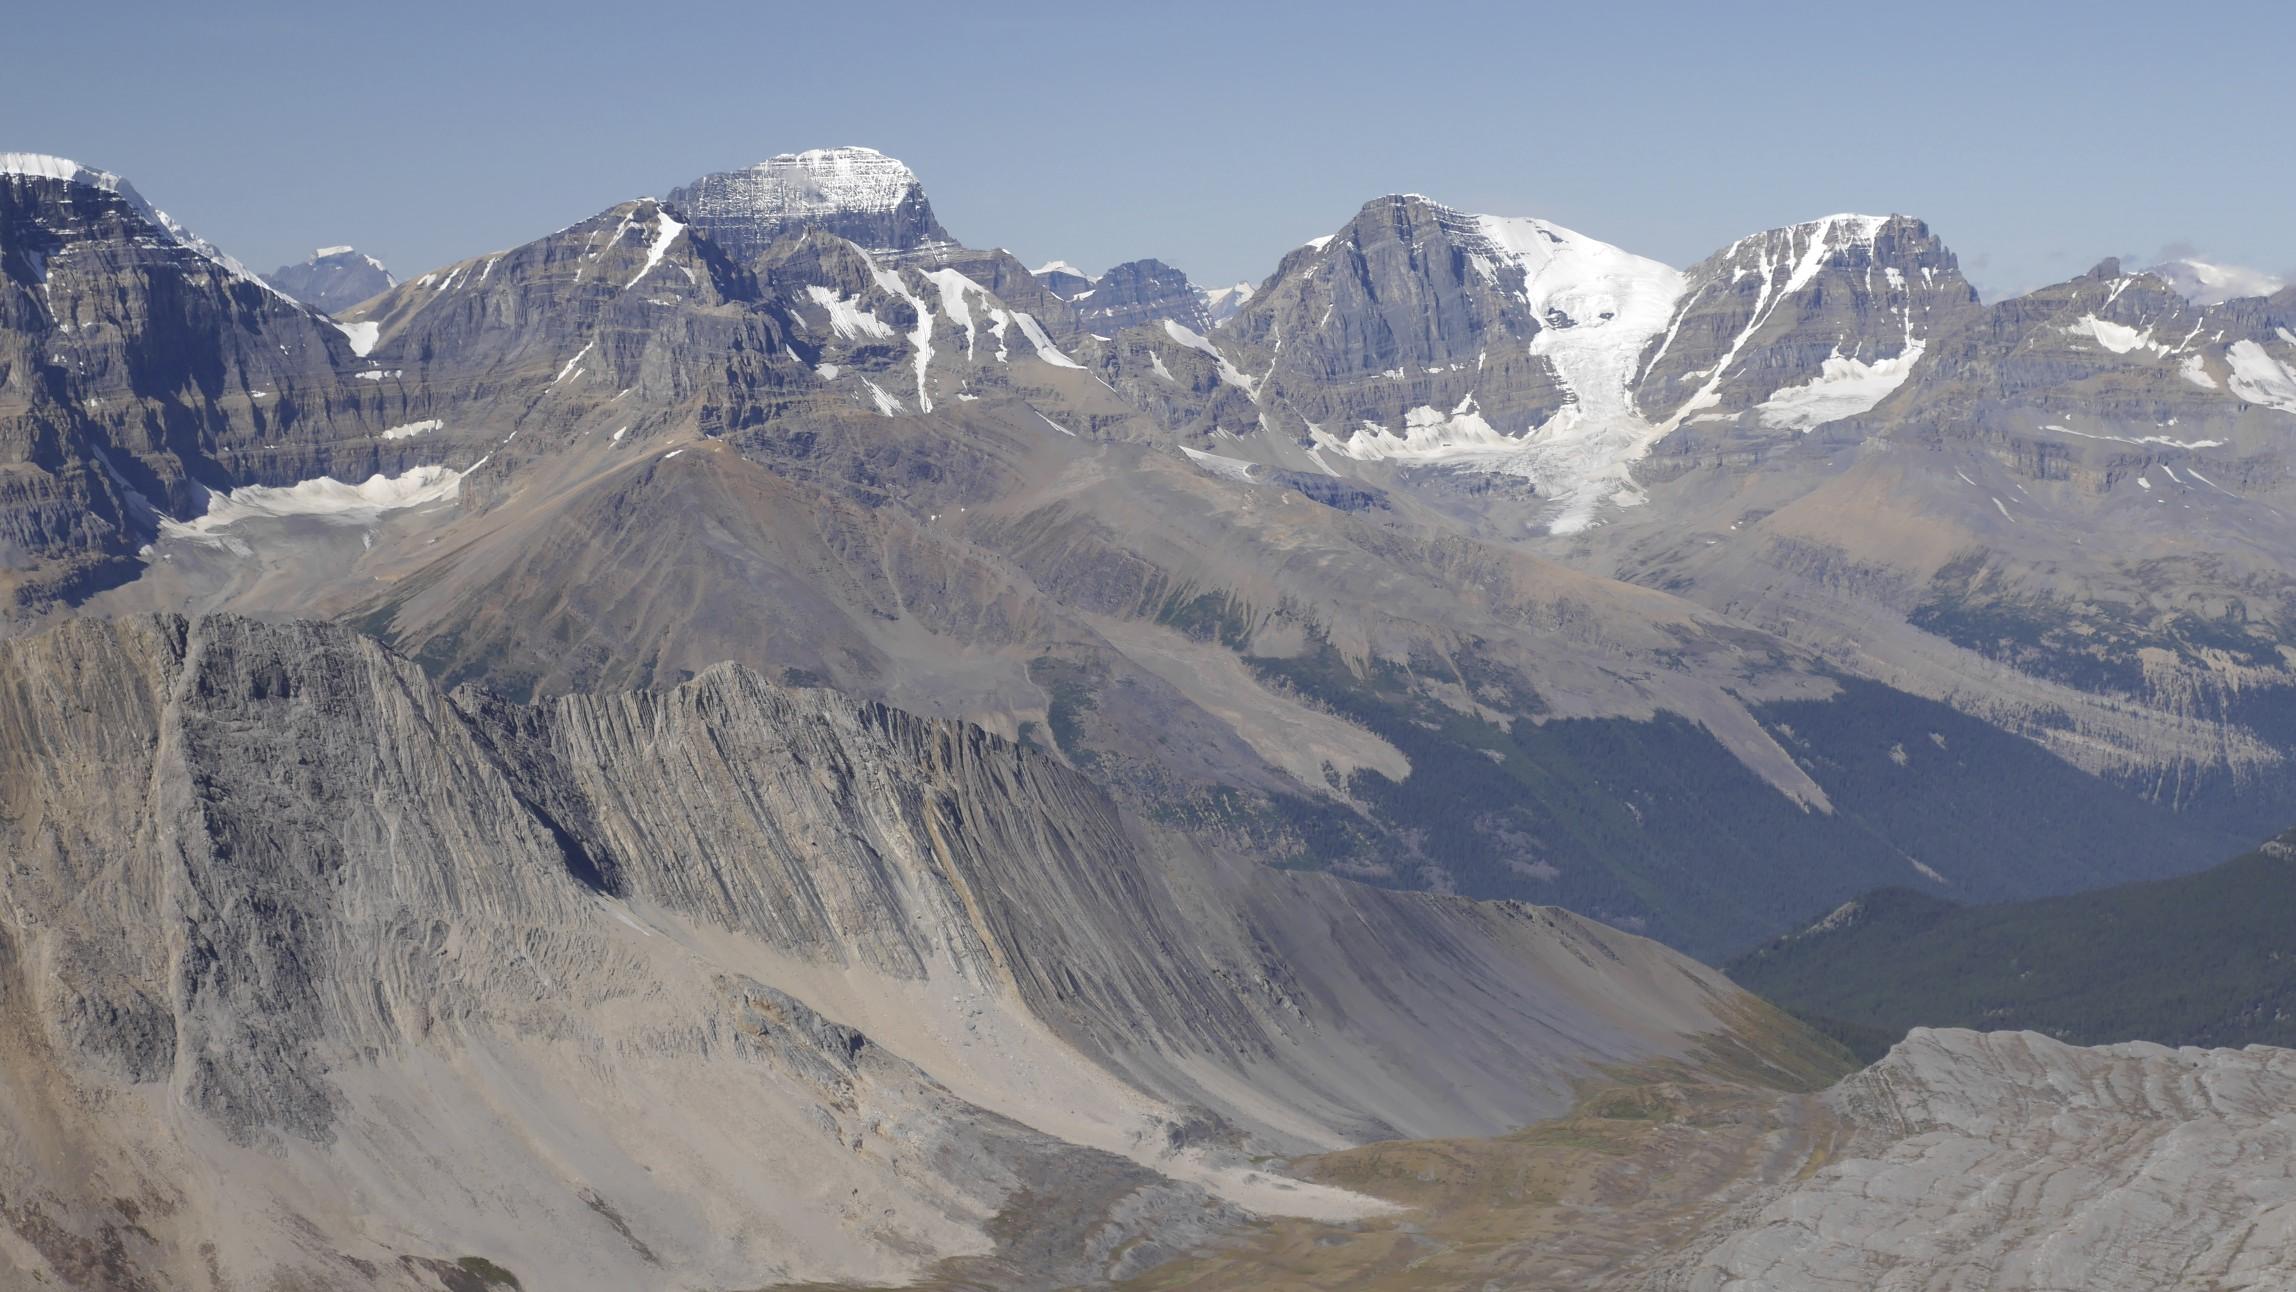 Mt. Alberta, Mt. Wooly and Mt. Diaden from Nigel Peak